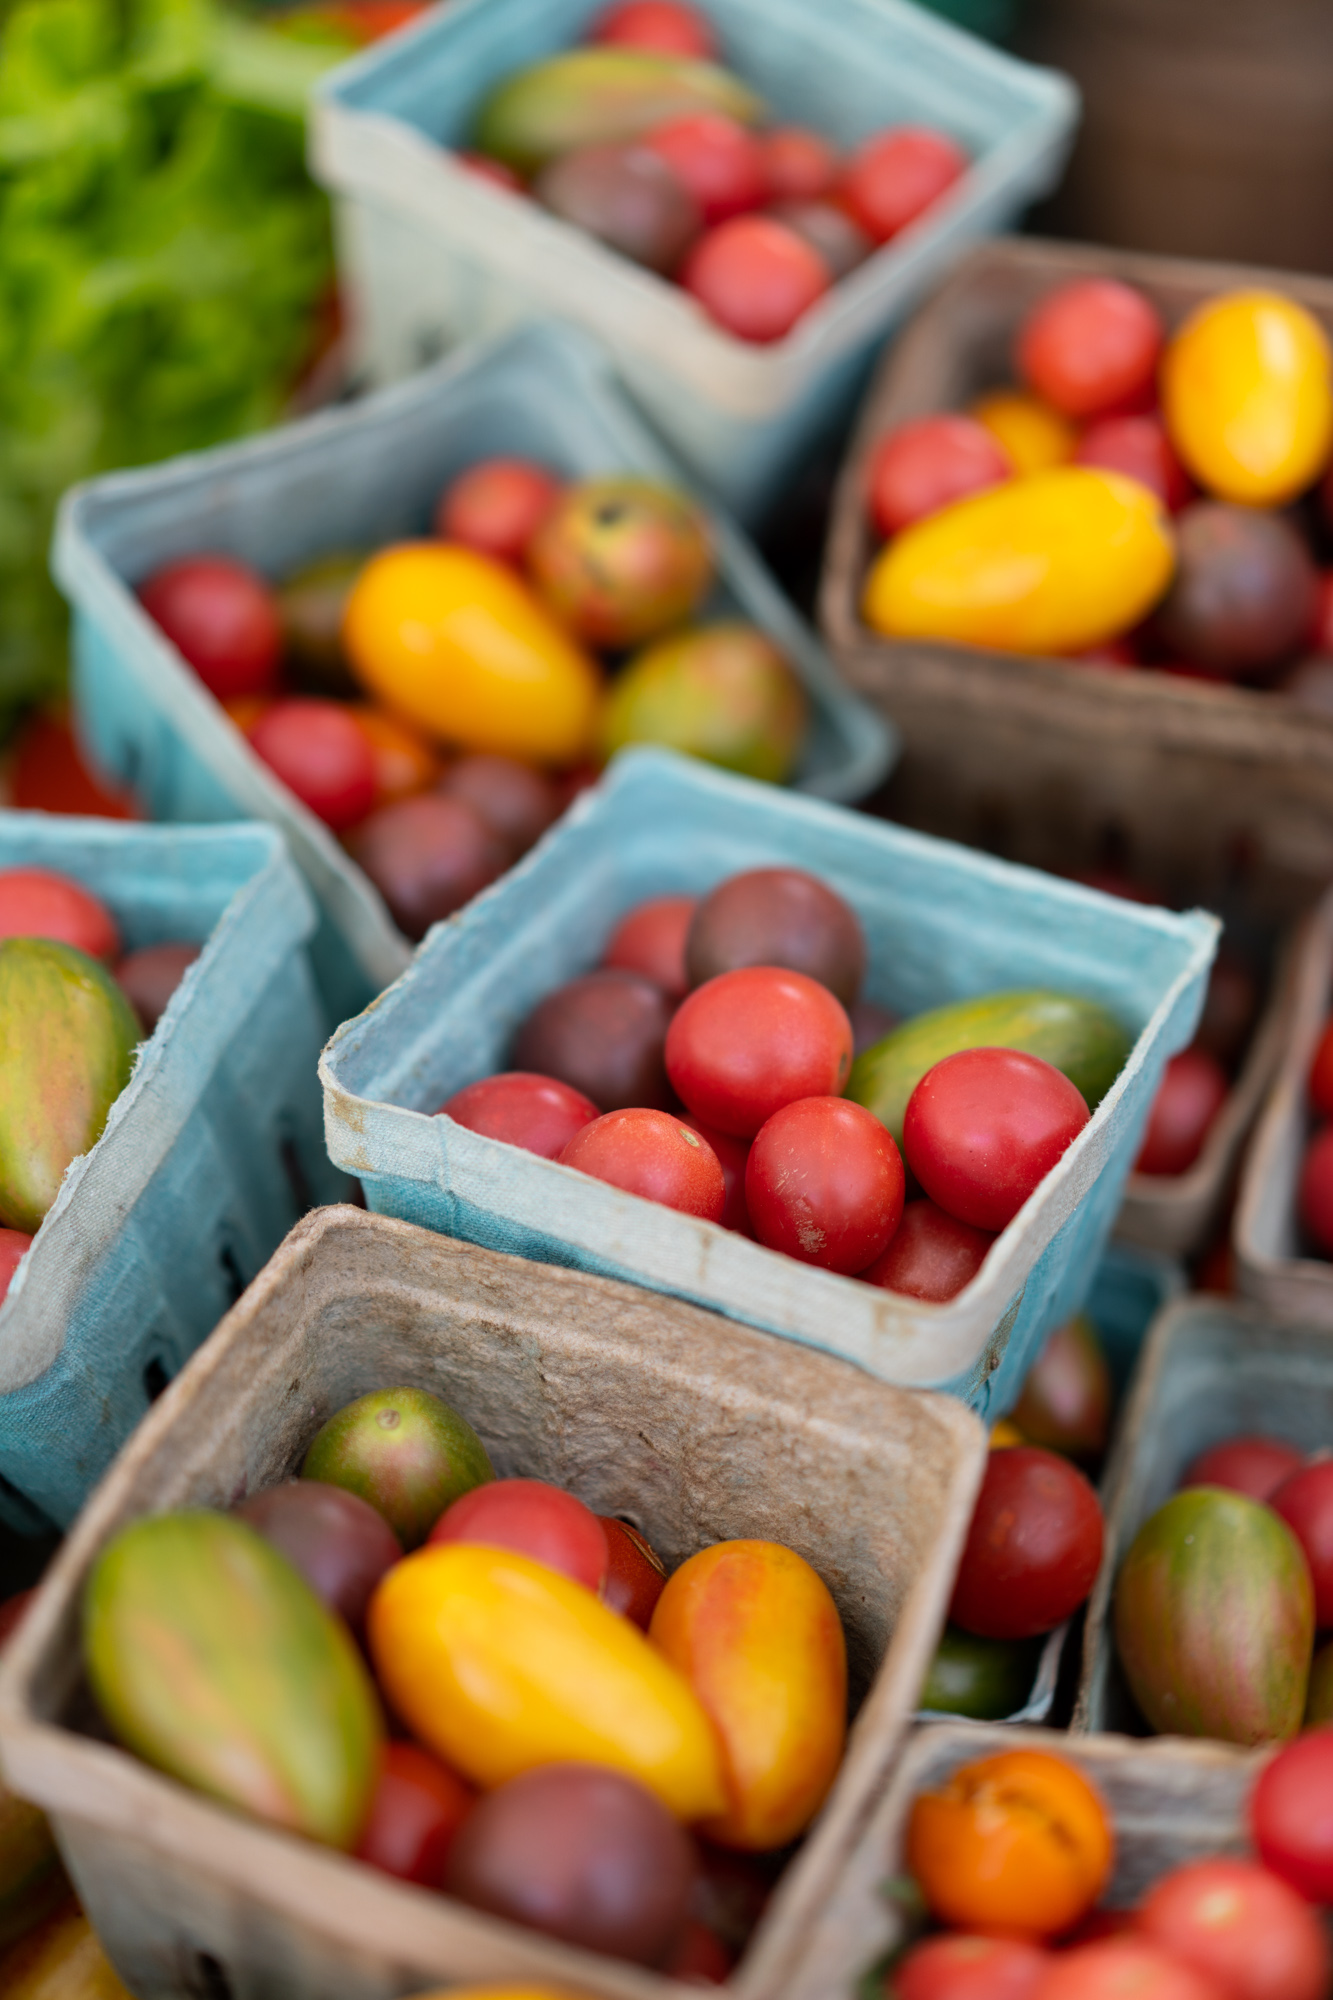 PFM_chickadee_tomatoes-1.jpg